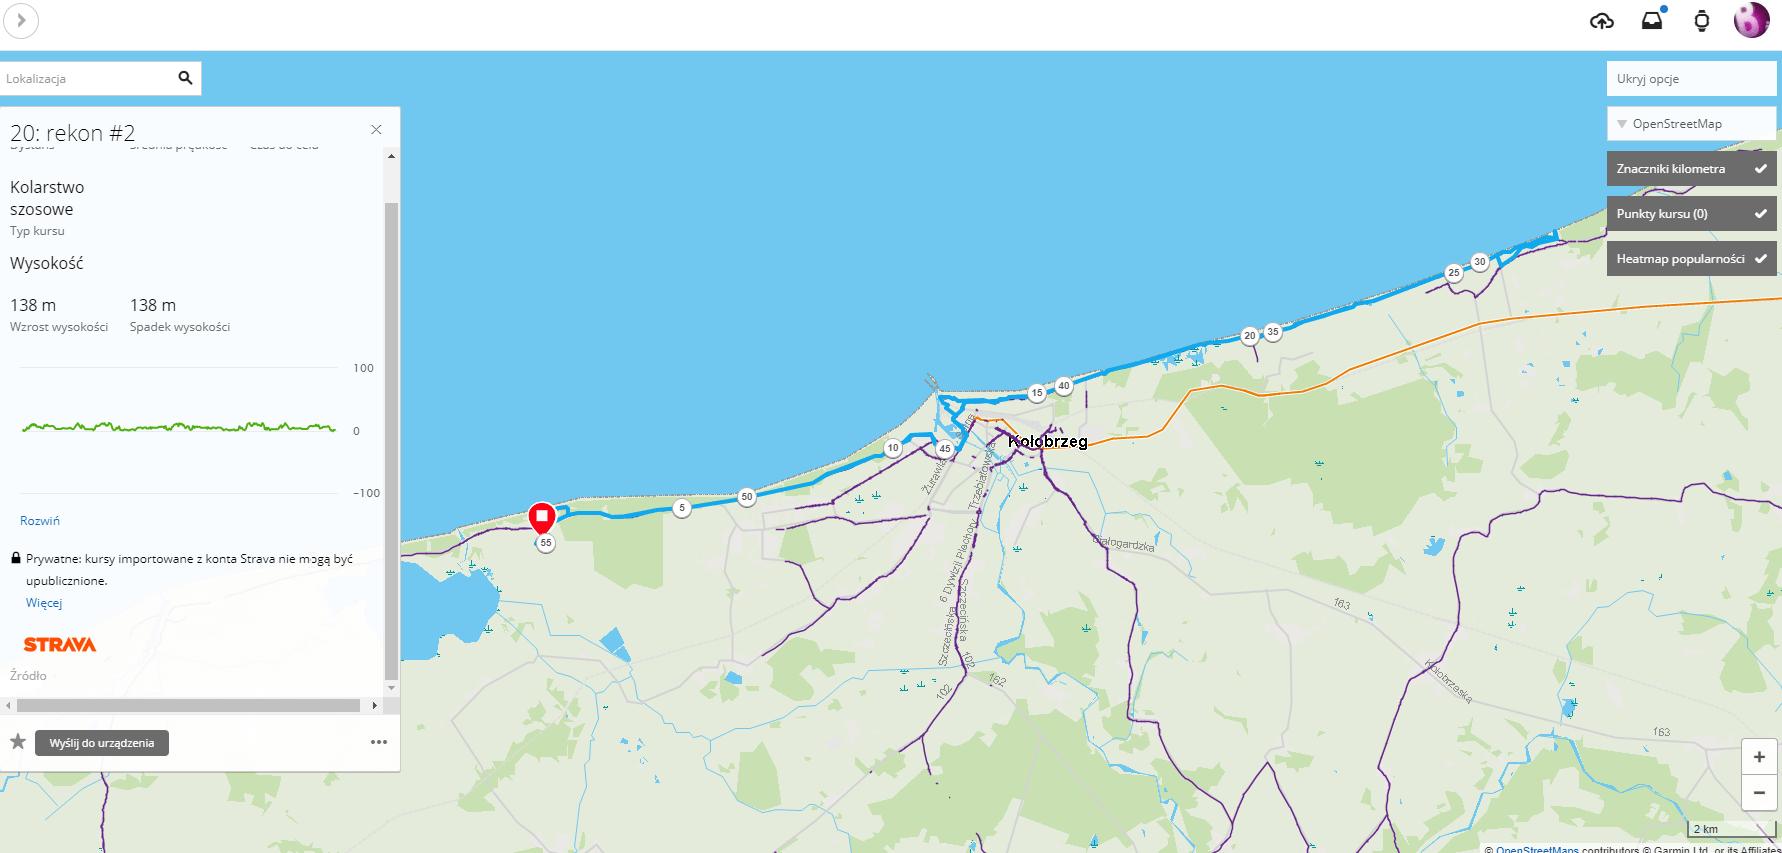 Garmin Connect - zaimportowaa trasa